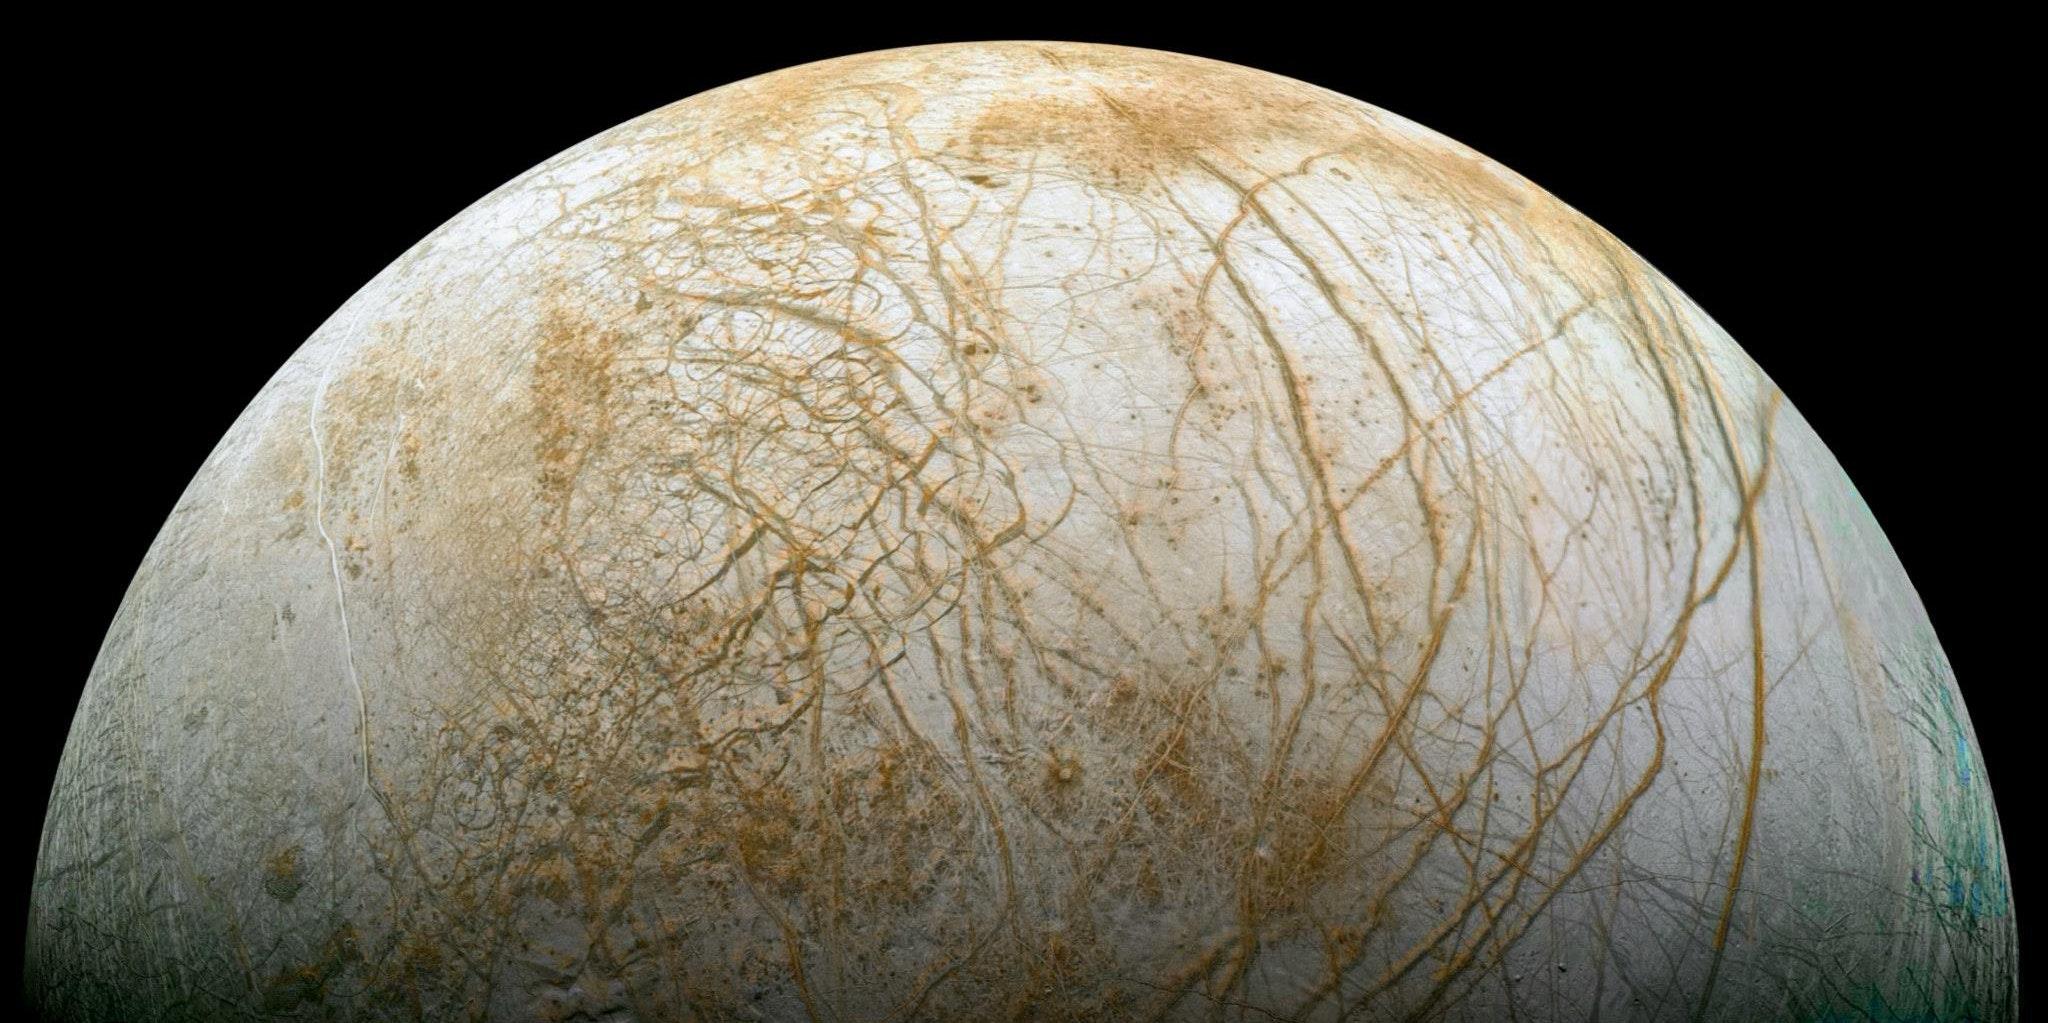 Jupiter's Weirdest Moon Looks Better Than Ever for Finding Aliens